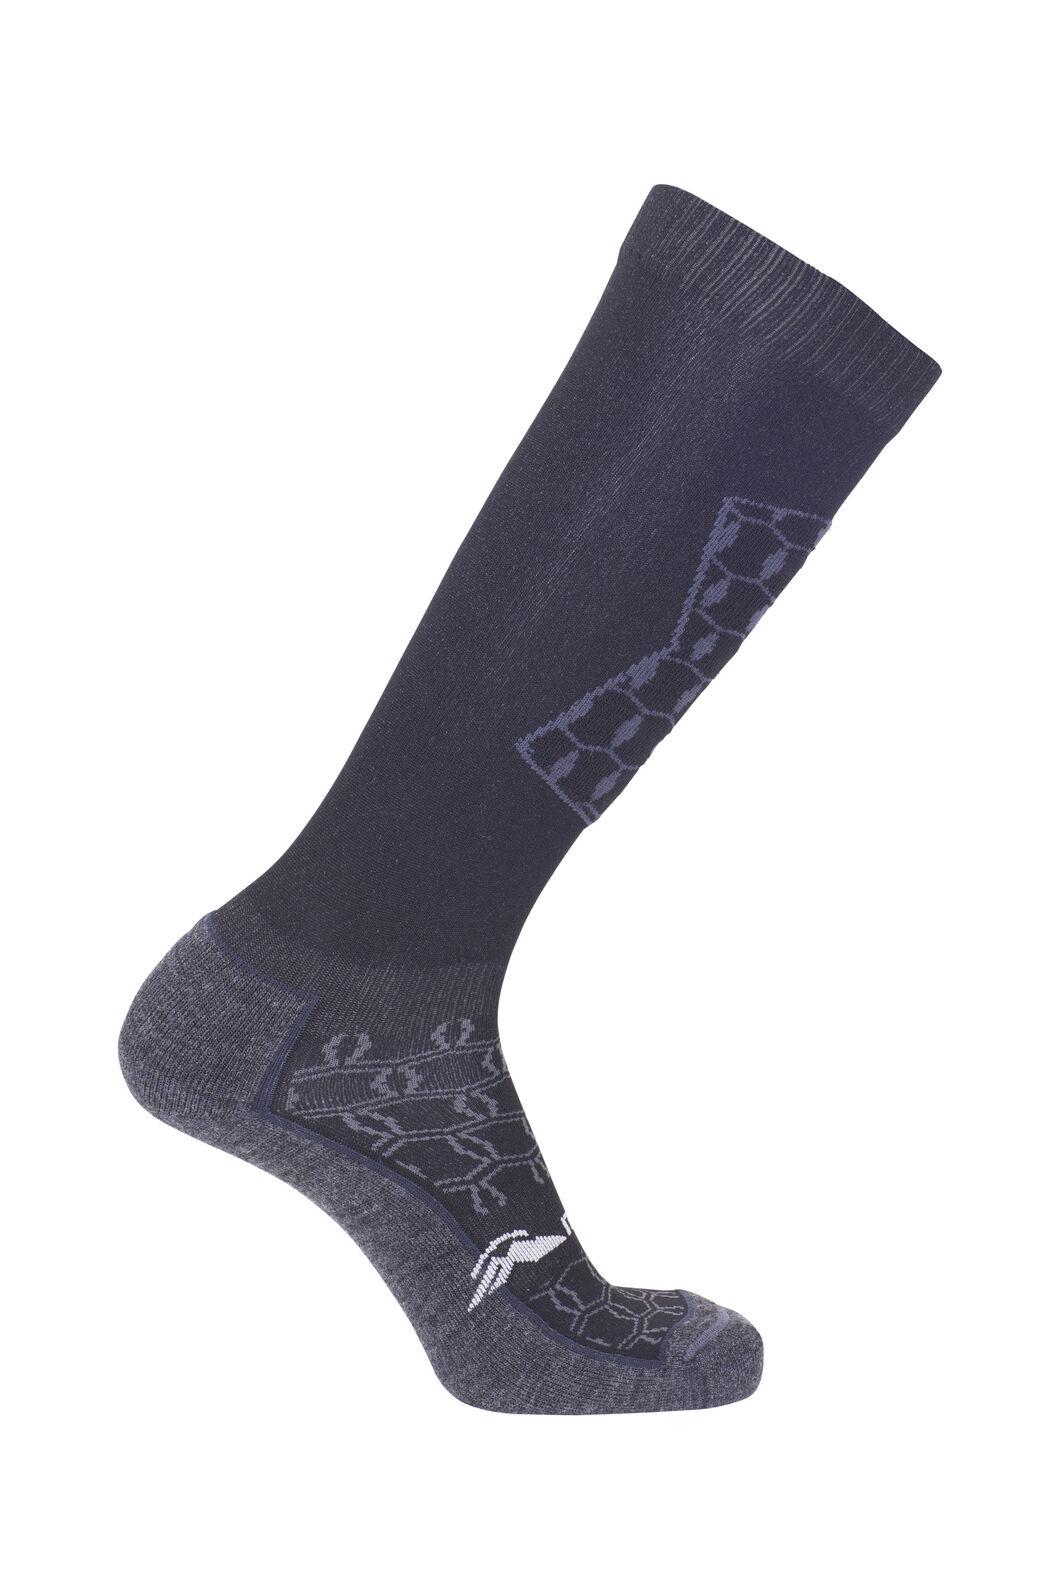 Macpac Tech Ski Socks, Black/Charcoal, hi-res